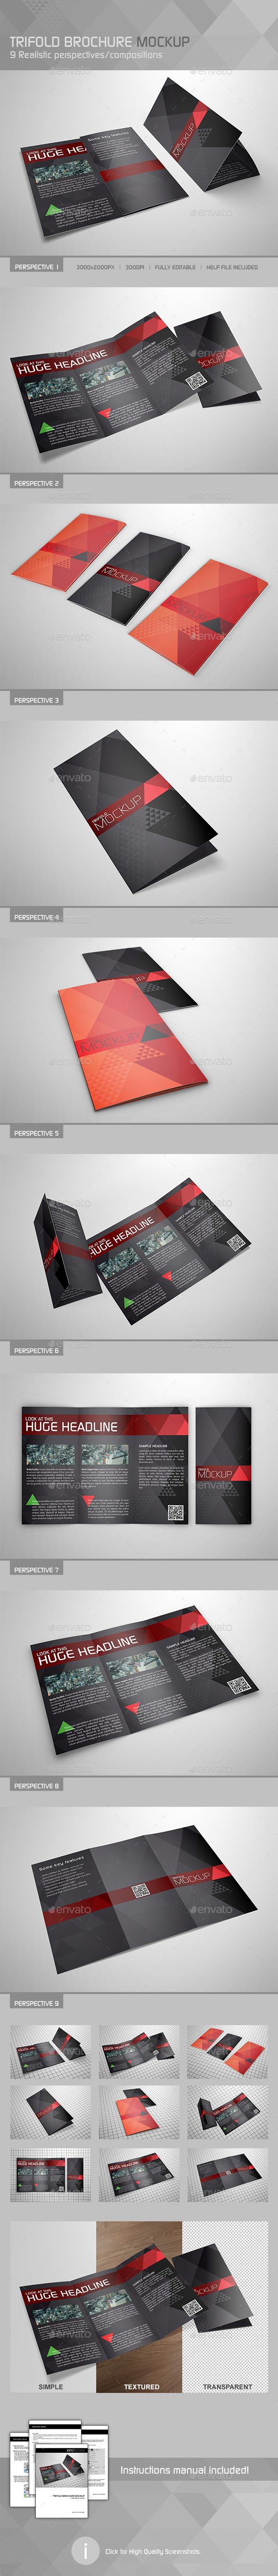 GraphicRiver Realistic Trifold Brochure Mockup 10995222